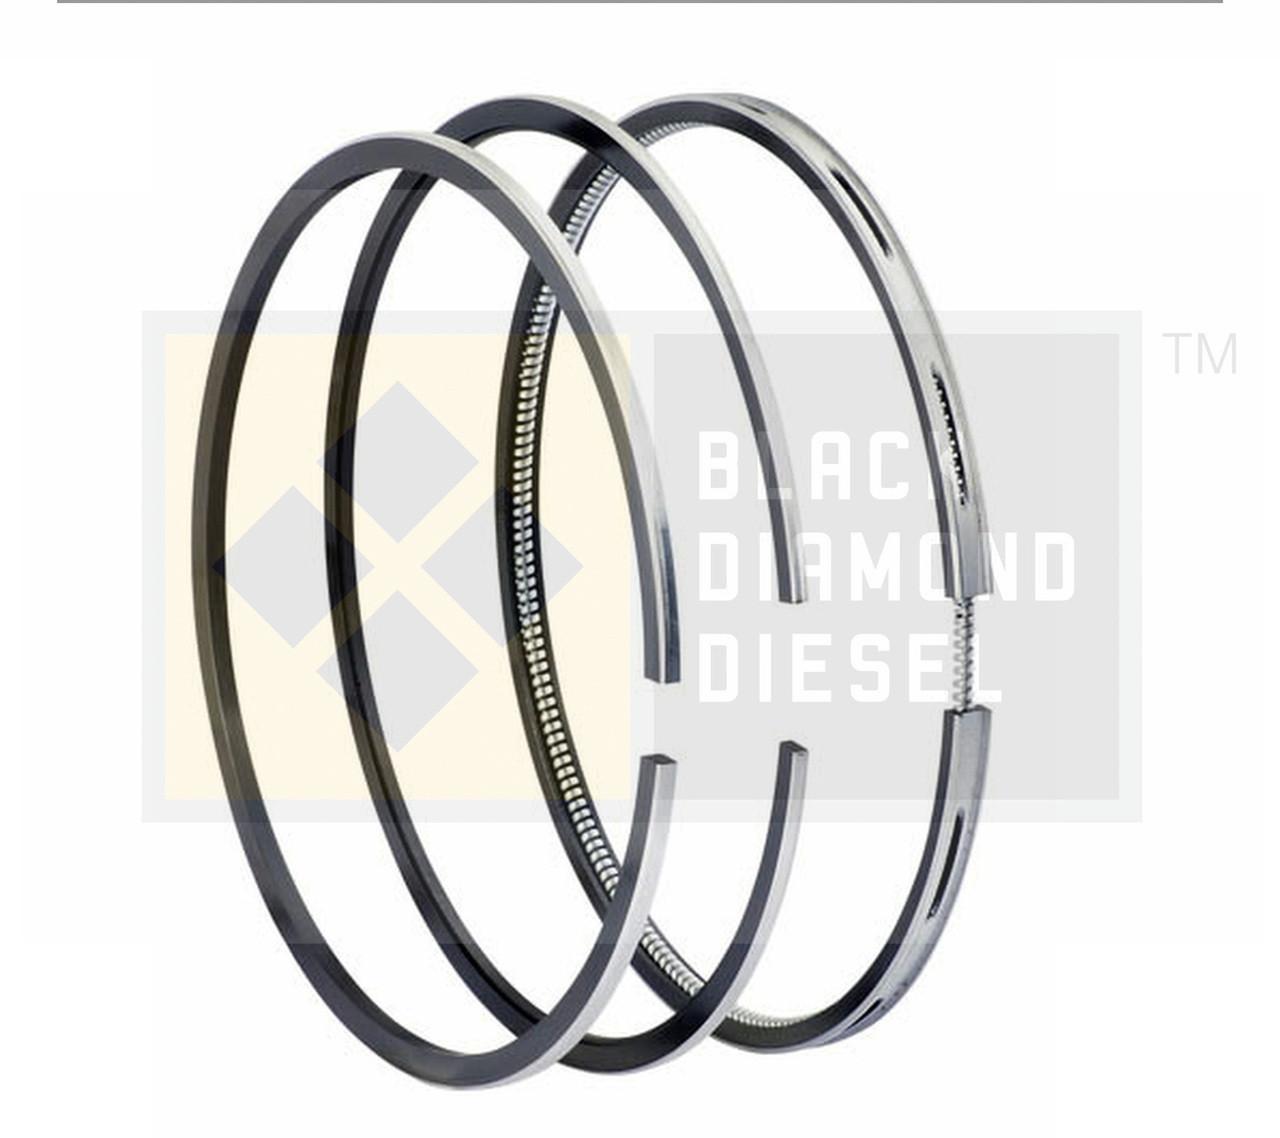 Black Diamond 07.5-10 Duramax 6.6 LMM Standard Piston Ring Set (1)